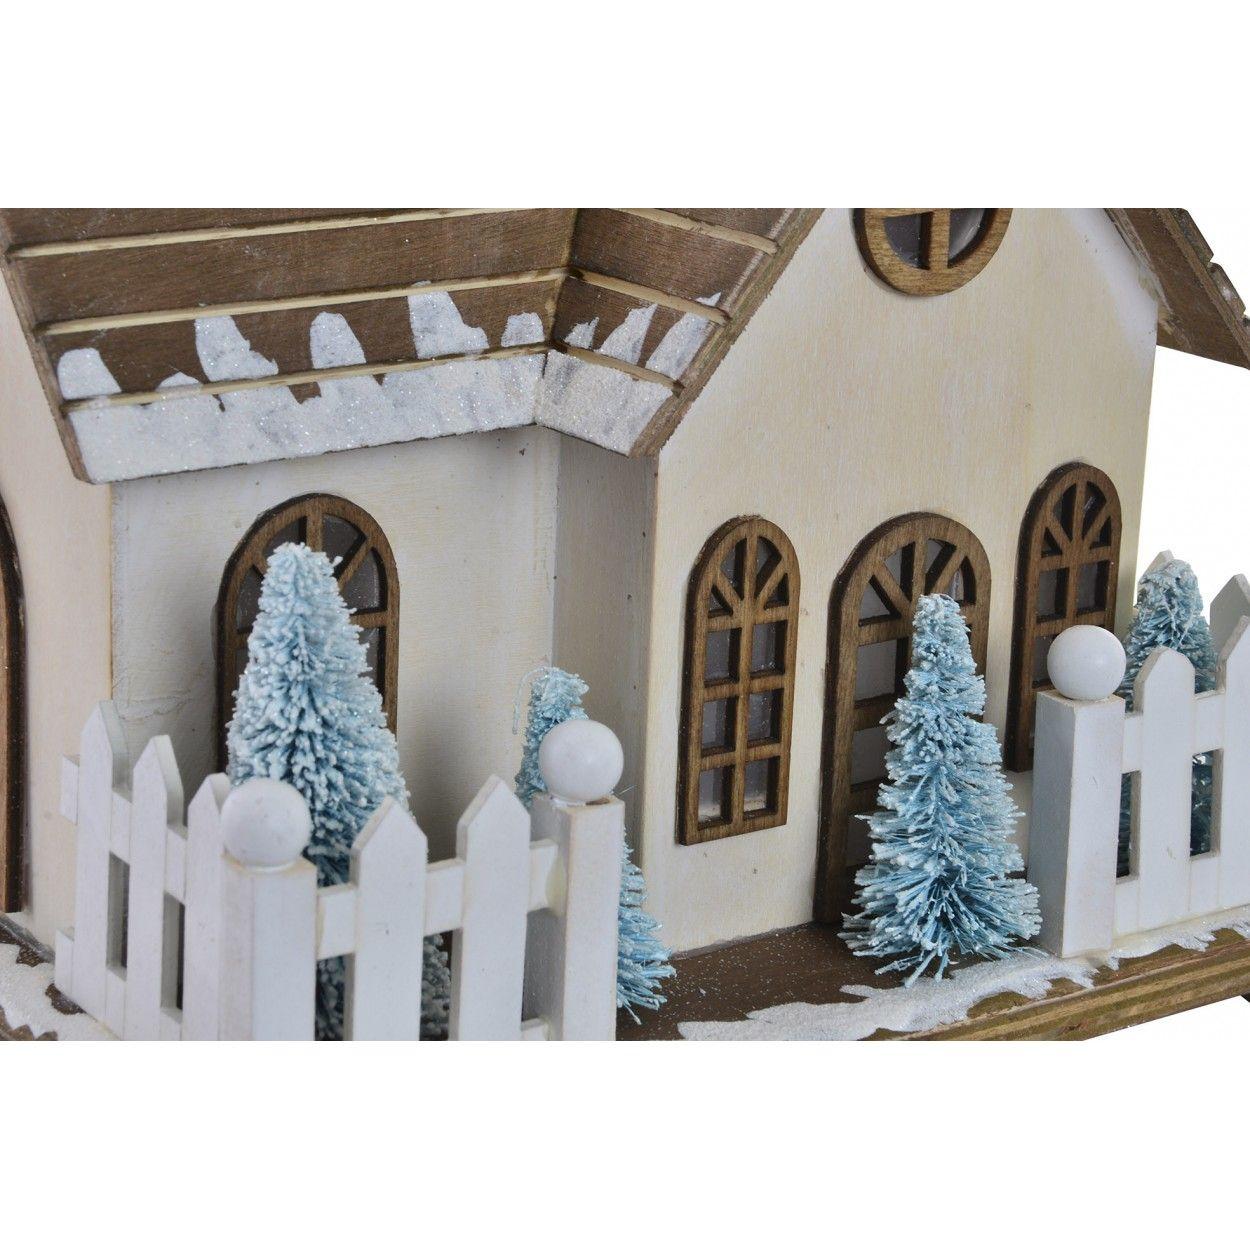 Casa de madera navidad con luces led decoraci n navide a for Decoracion navidena original